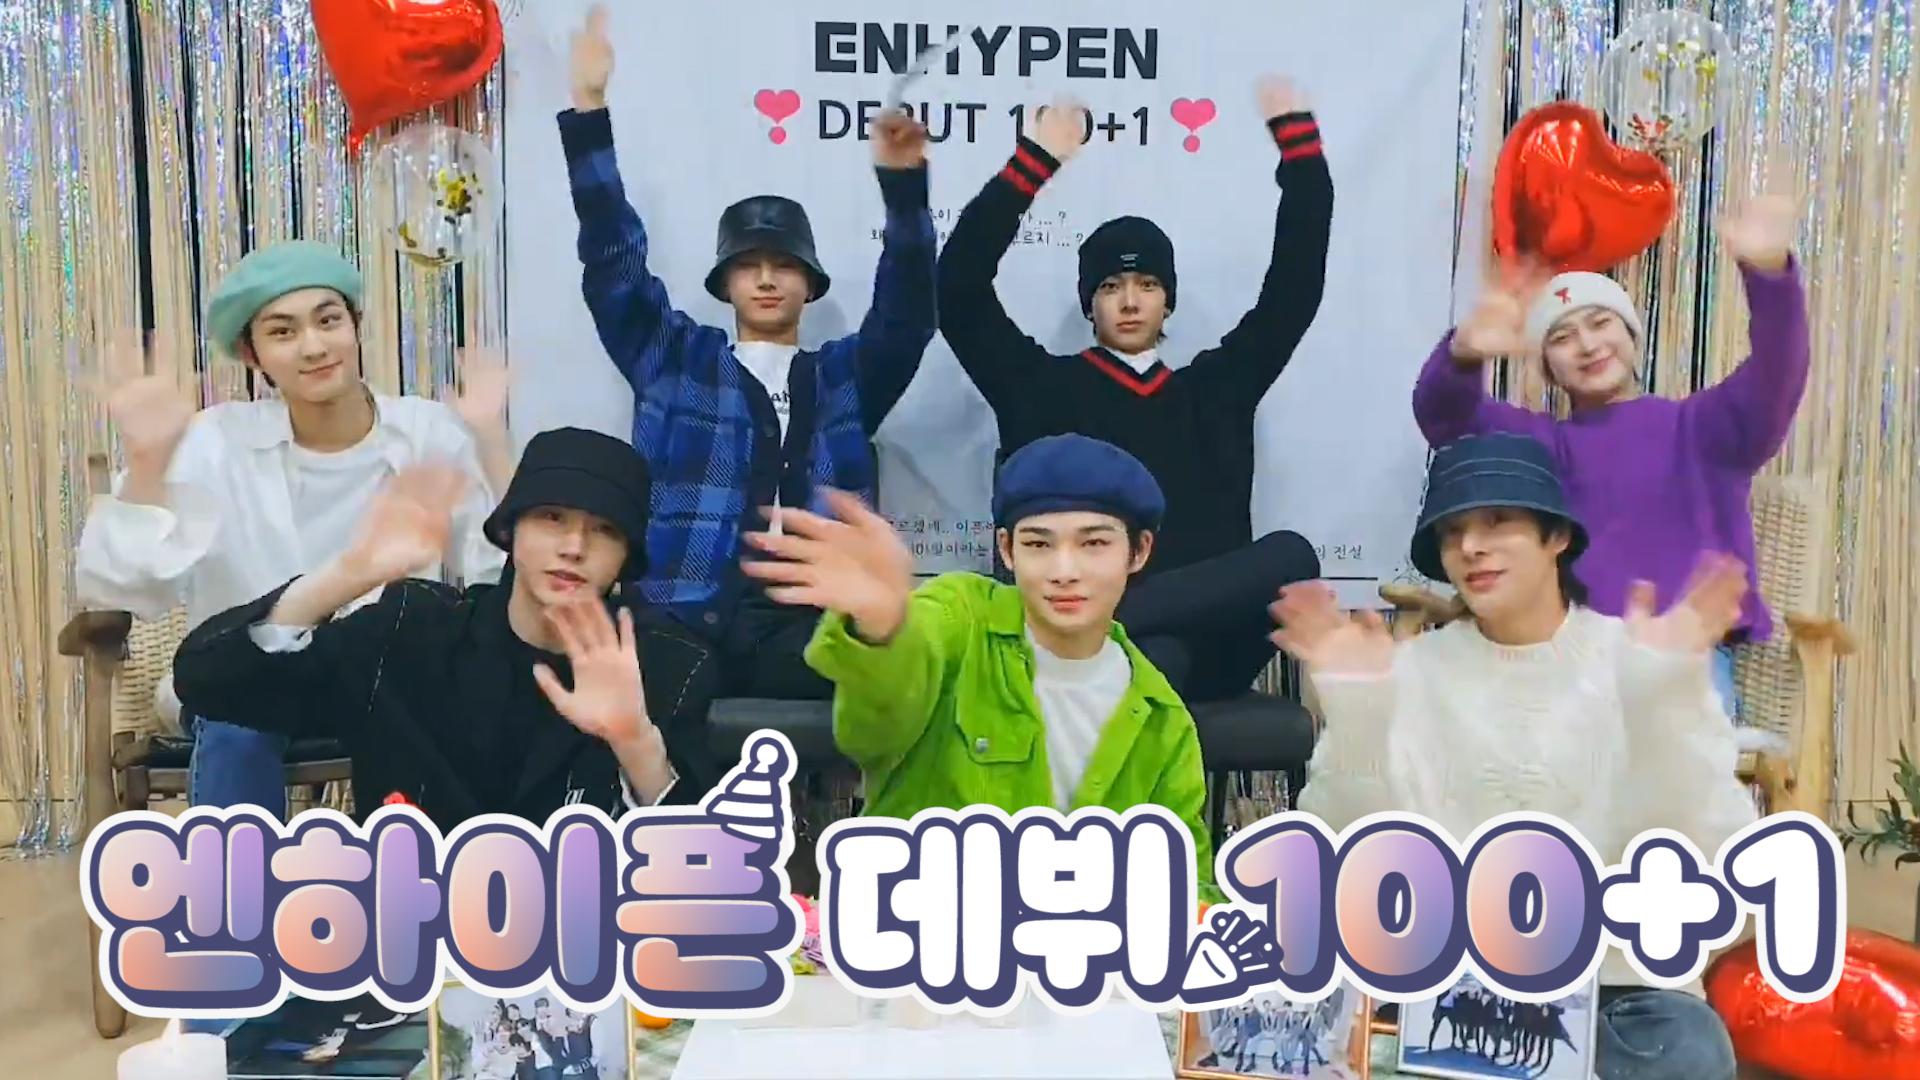 [ENHYPEN] 울하이픈이랑 함께하는 매일매일이 기념일이라구요❣️💐 (ENHYPEN's 100th day anniversary V!)